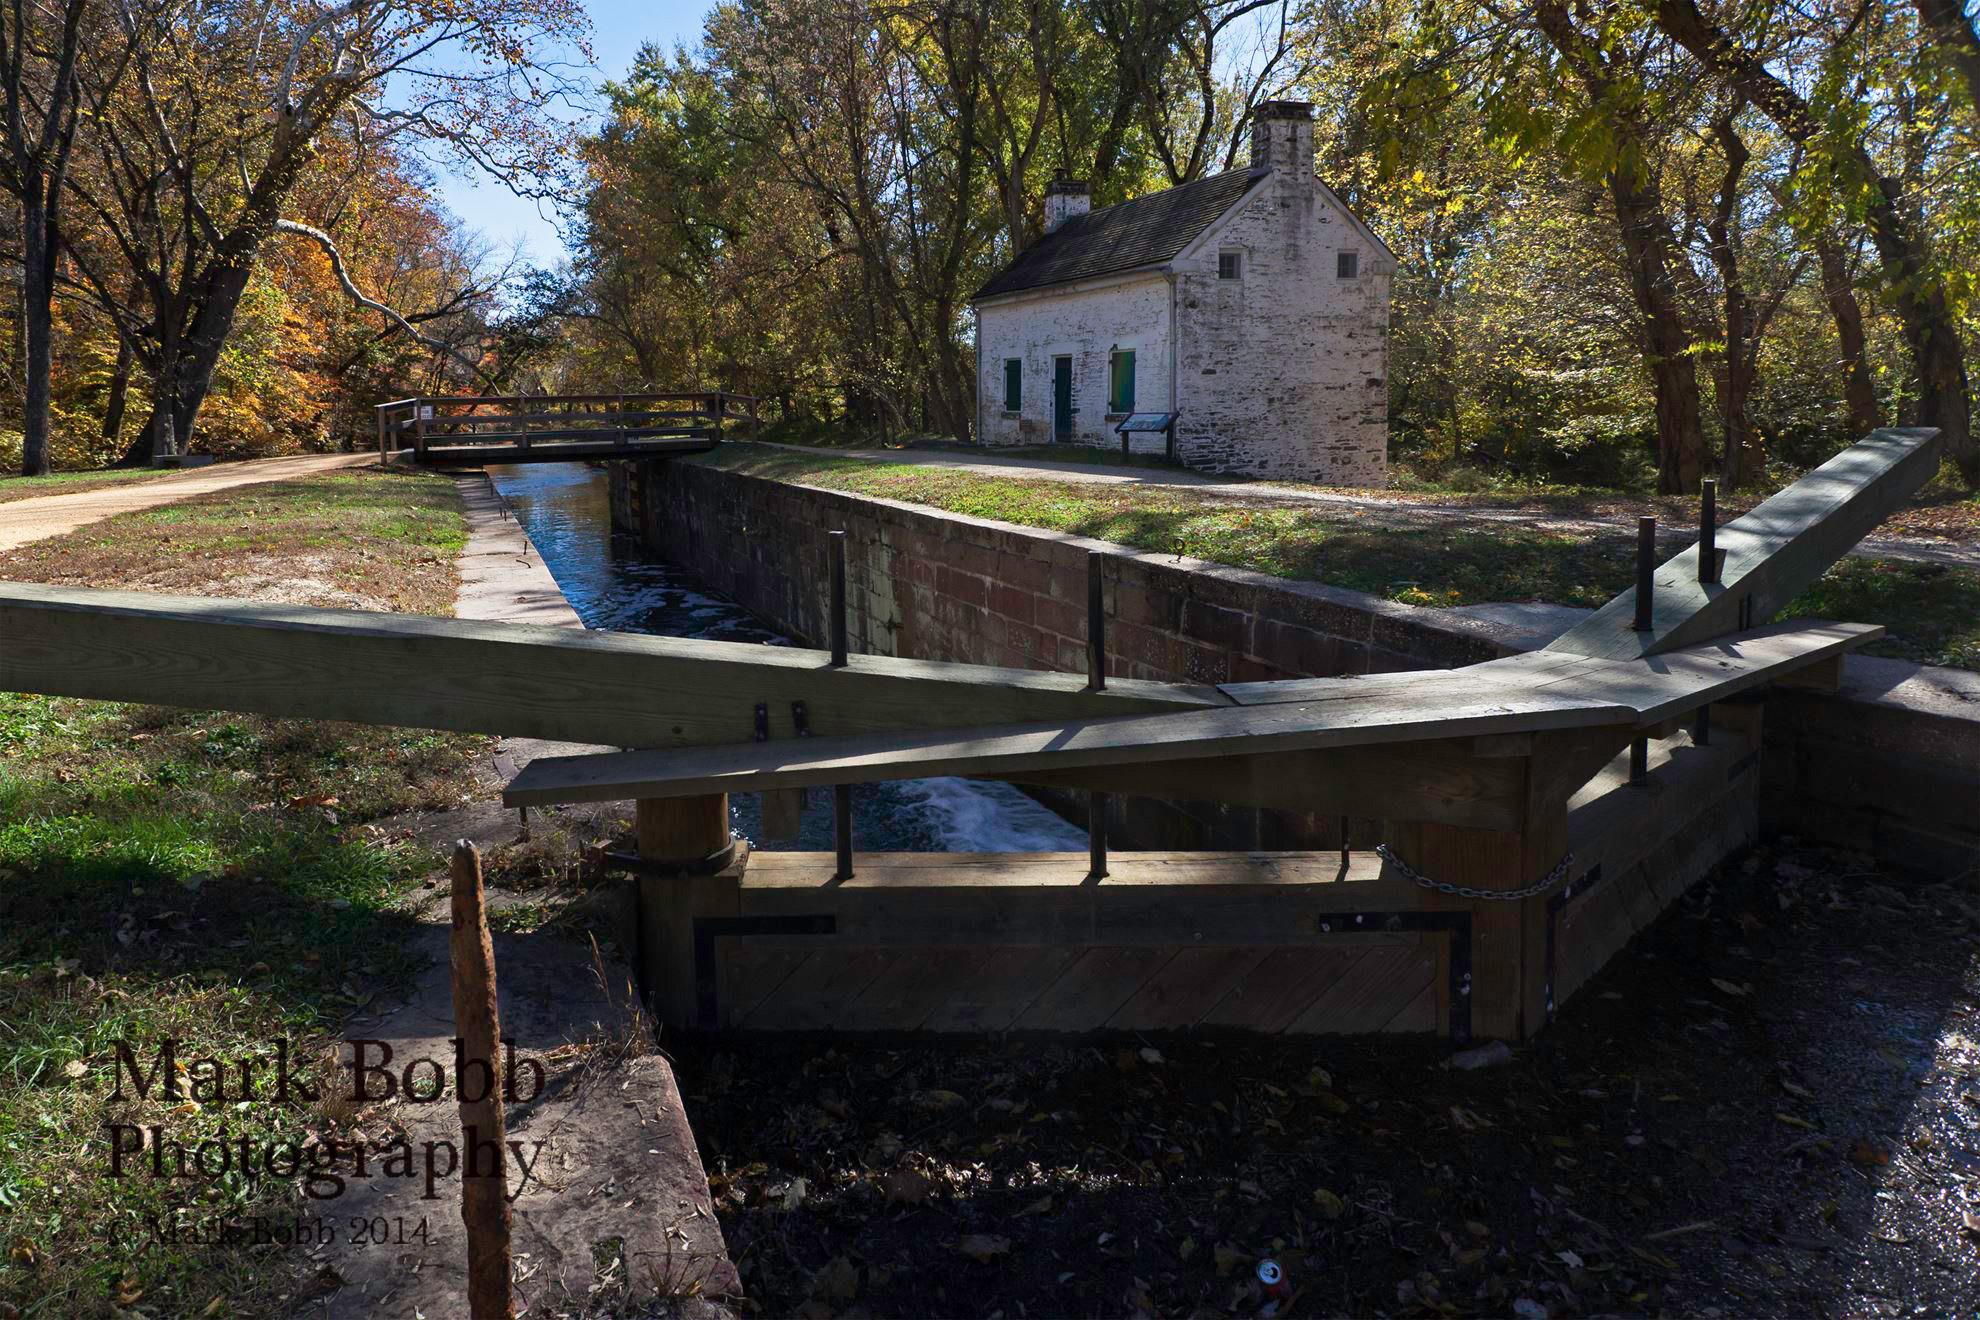 Chesapeake and Ohio Canal - Lift Locks